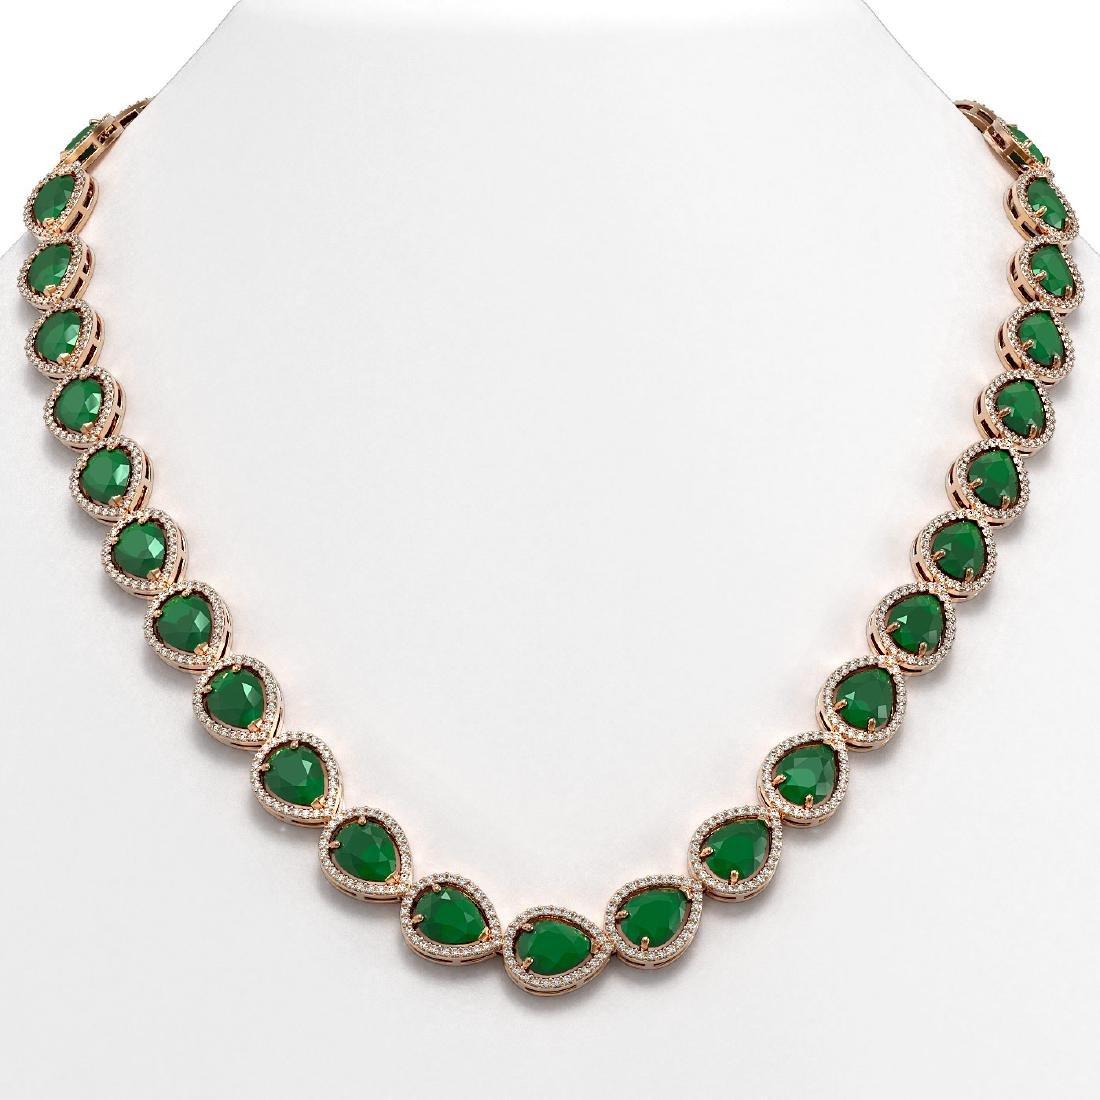 64.01 CTW Emerald & Diamond Halo Necklace 10K Rose Gold